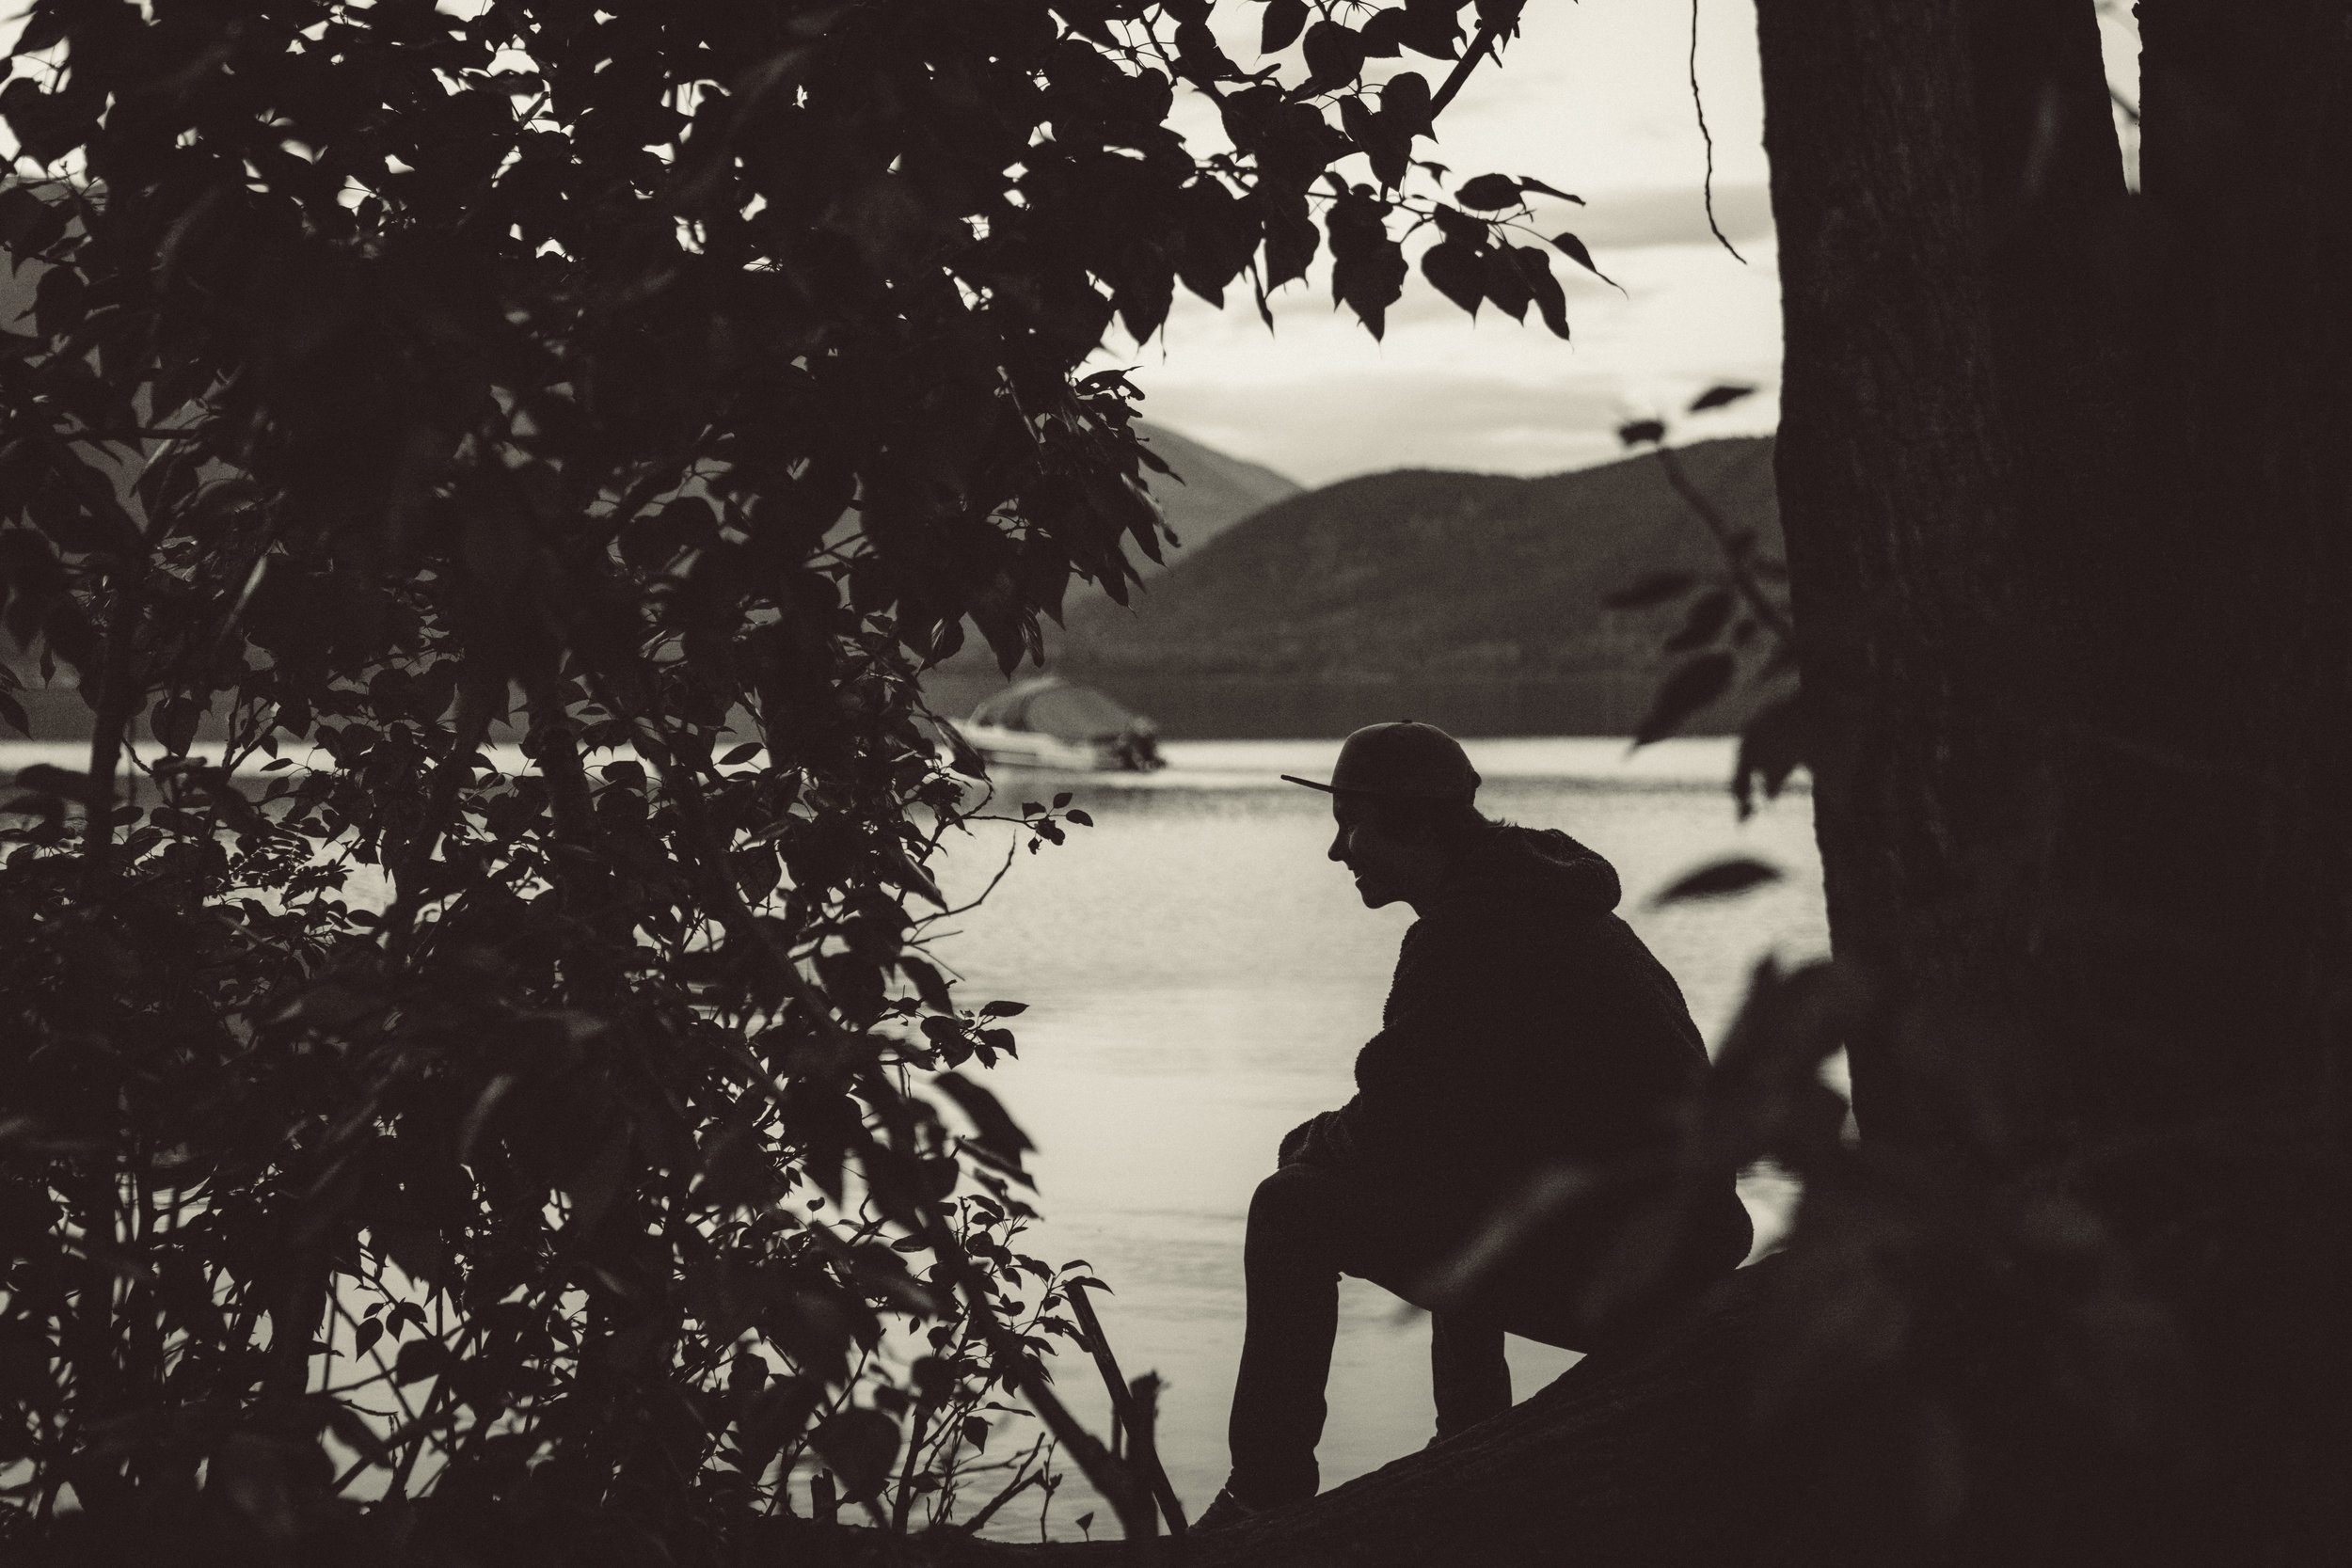 Ben at the lake.